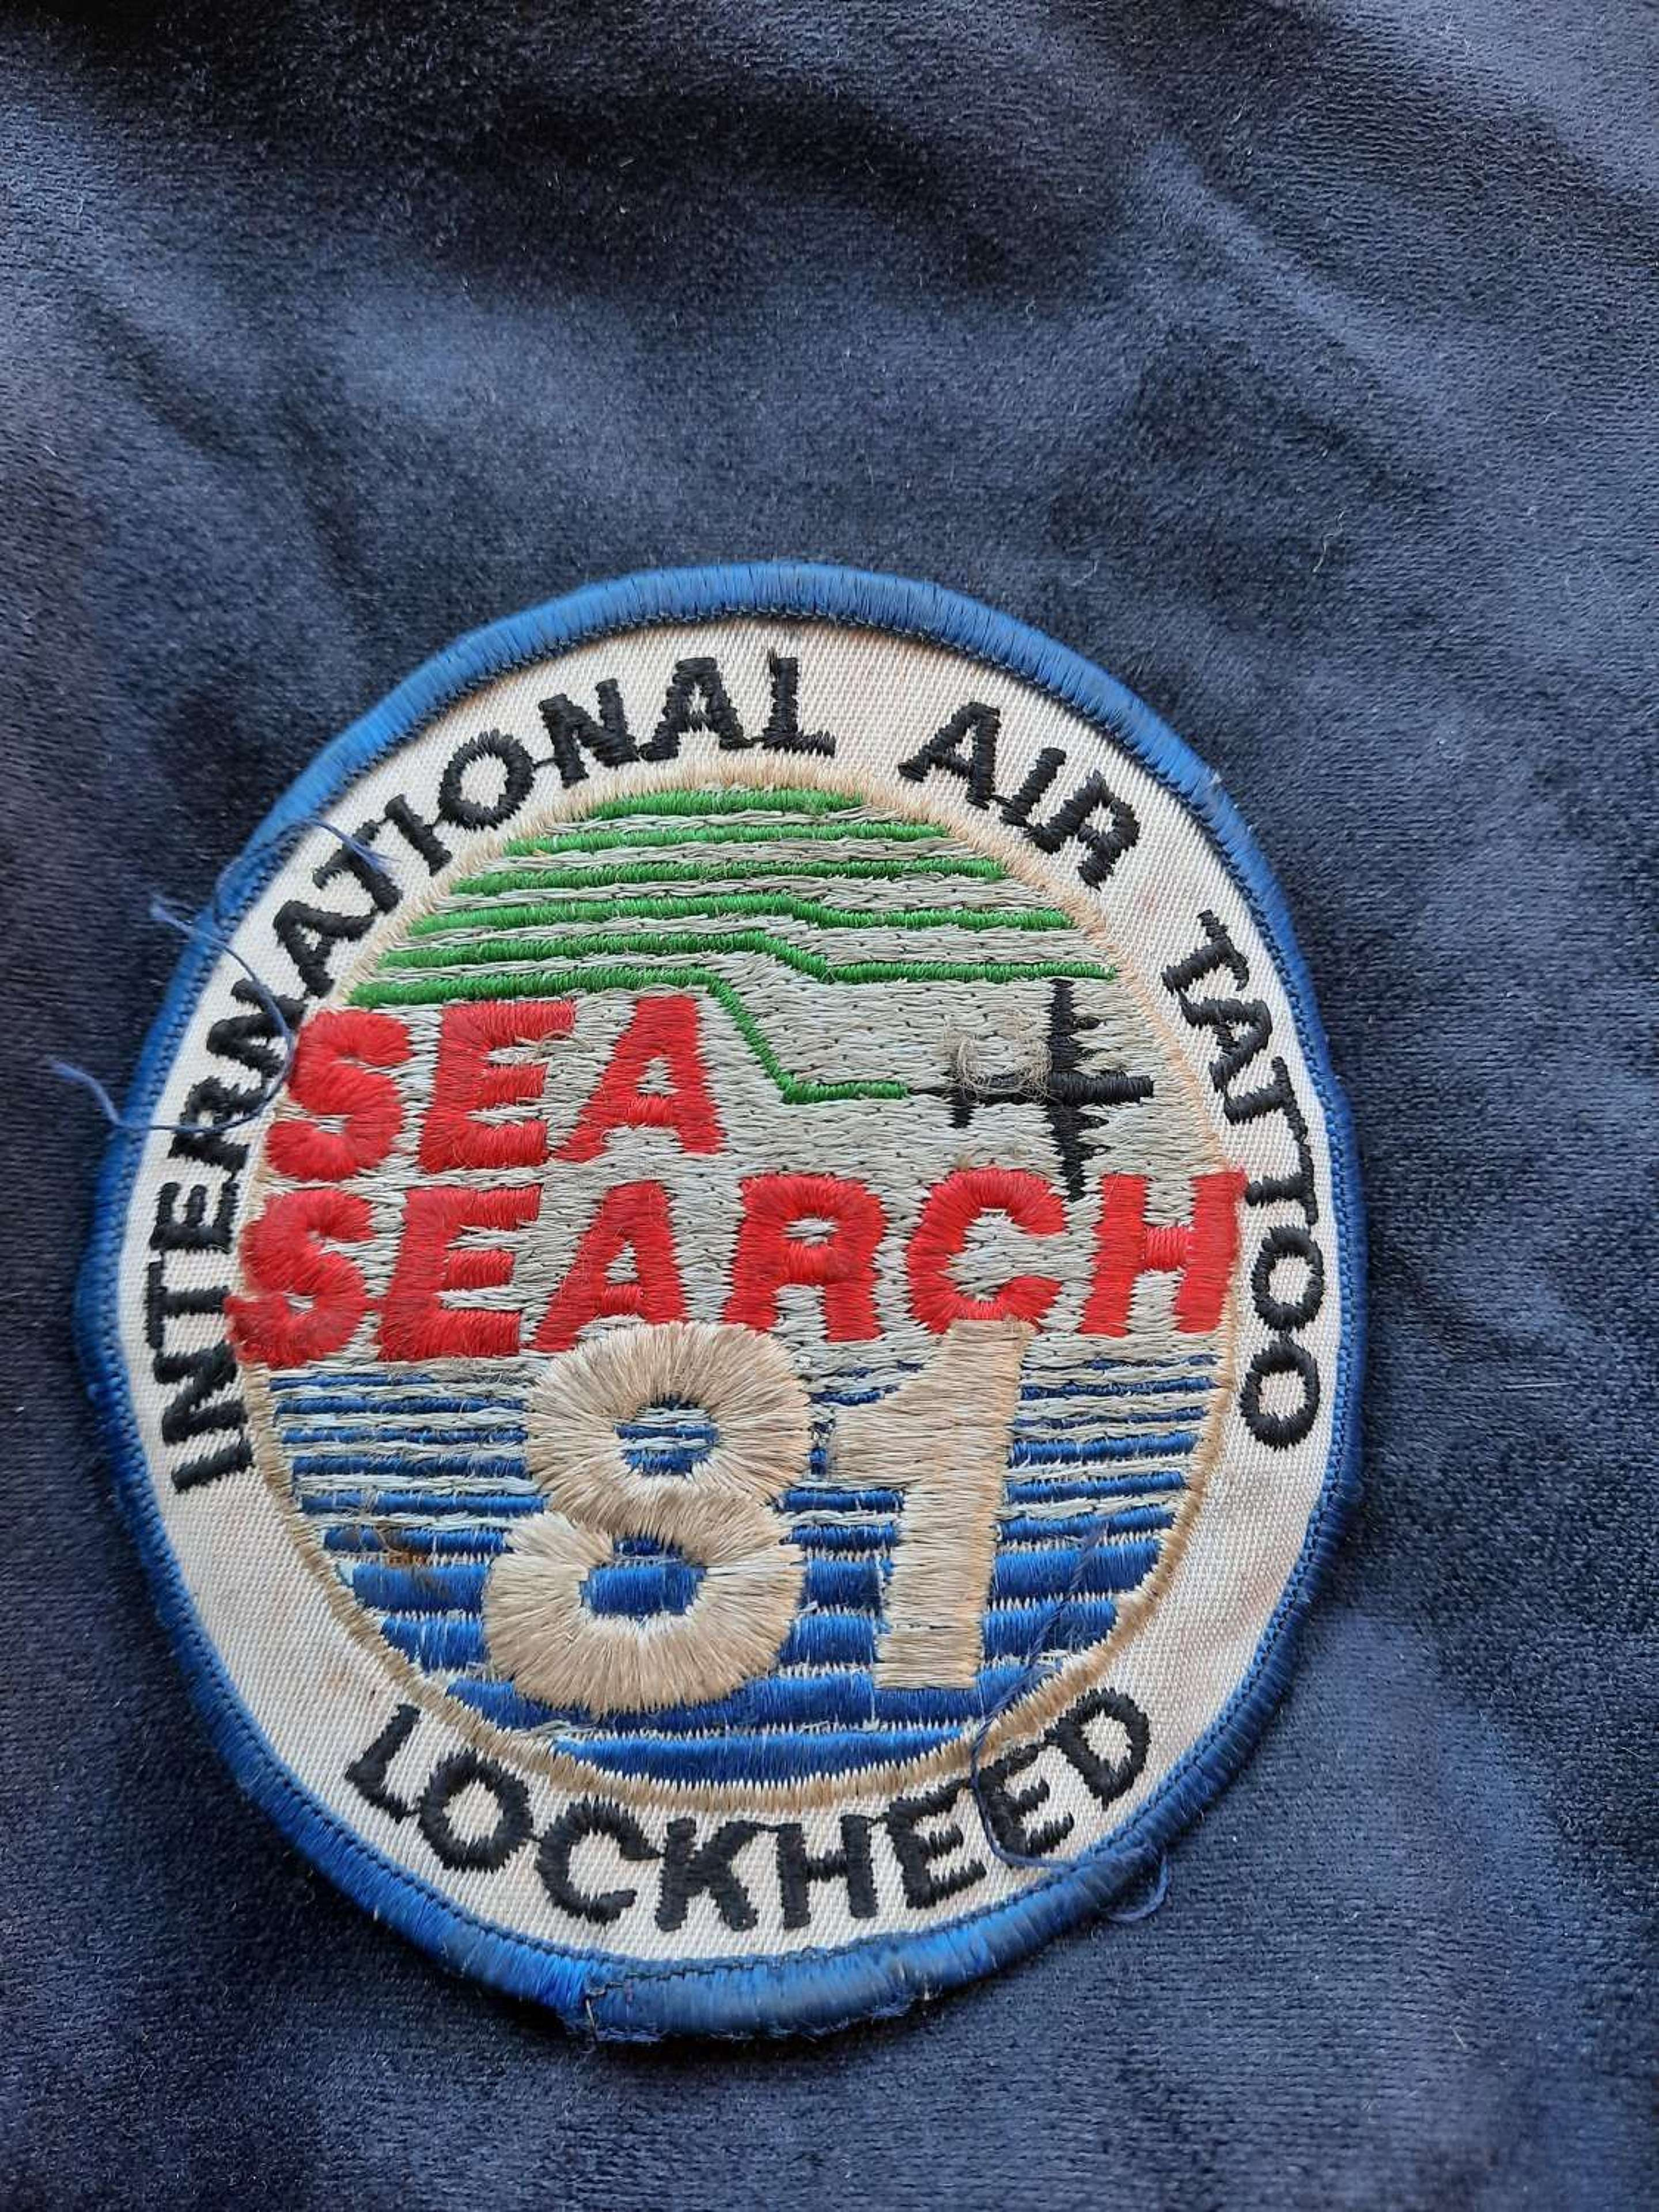 International Air Tattoo Sea Search 81 Patch